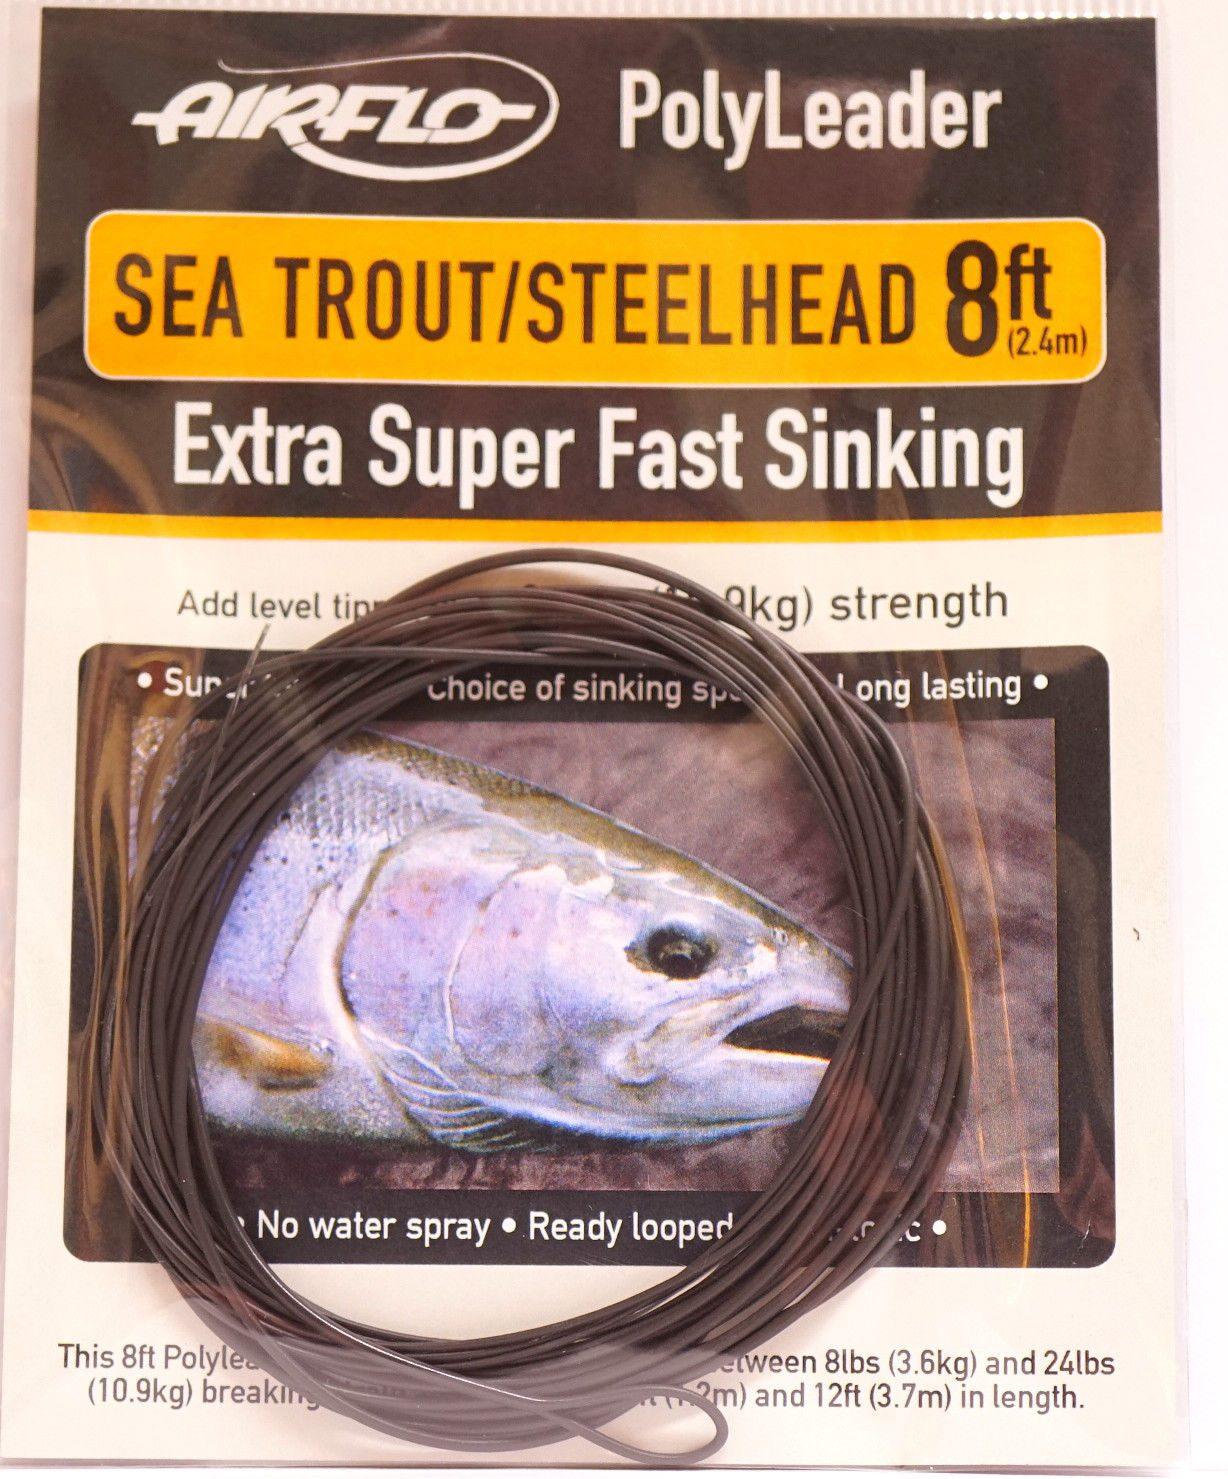 Steelhead 5 Extra Super Fast Sinking Airflo Polyleader Salmon